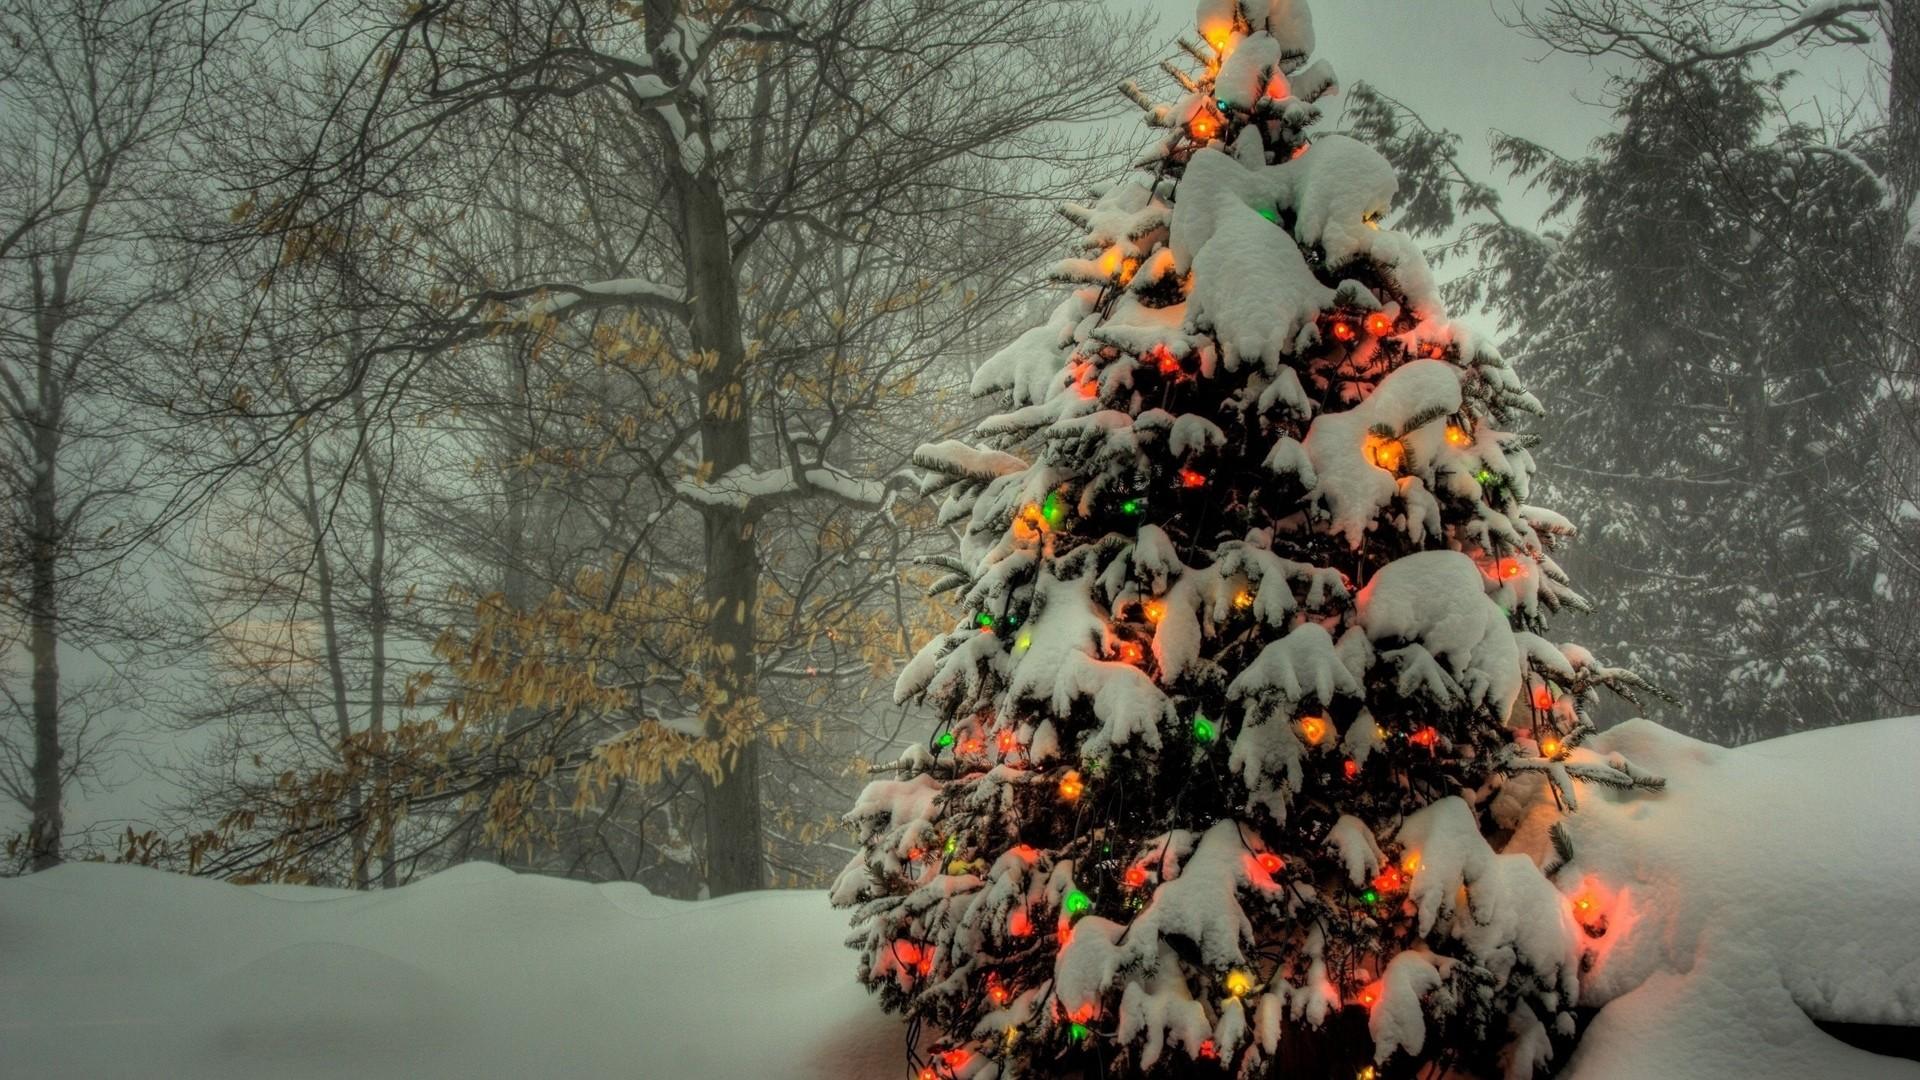 … Background Full HD 1080p. Wallpaper christmas tree, toys,  light, snow